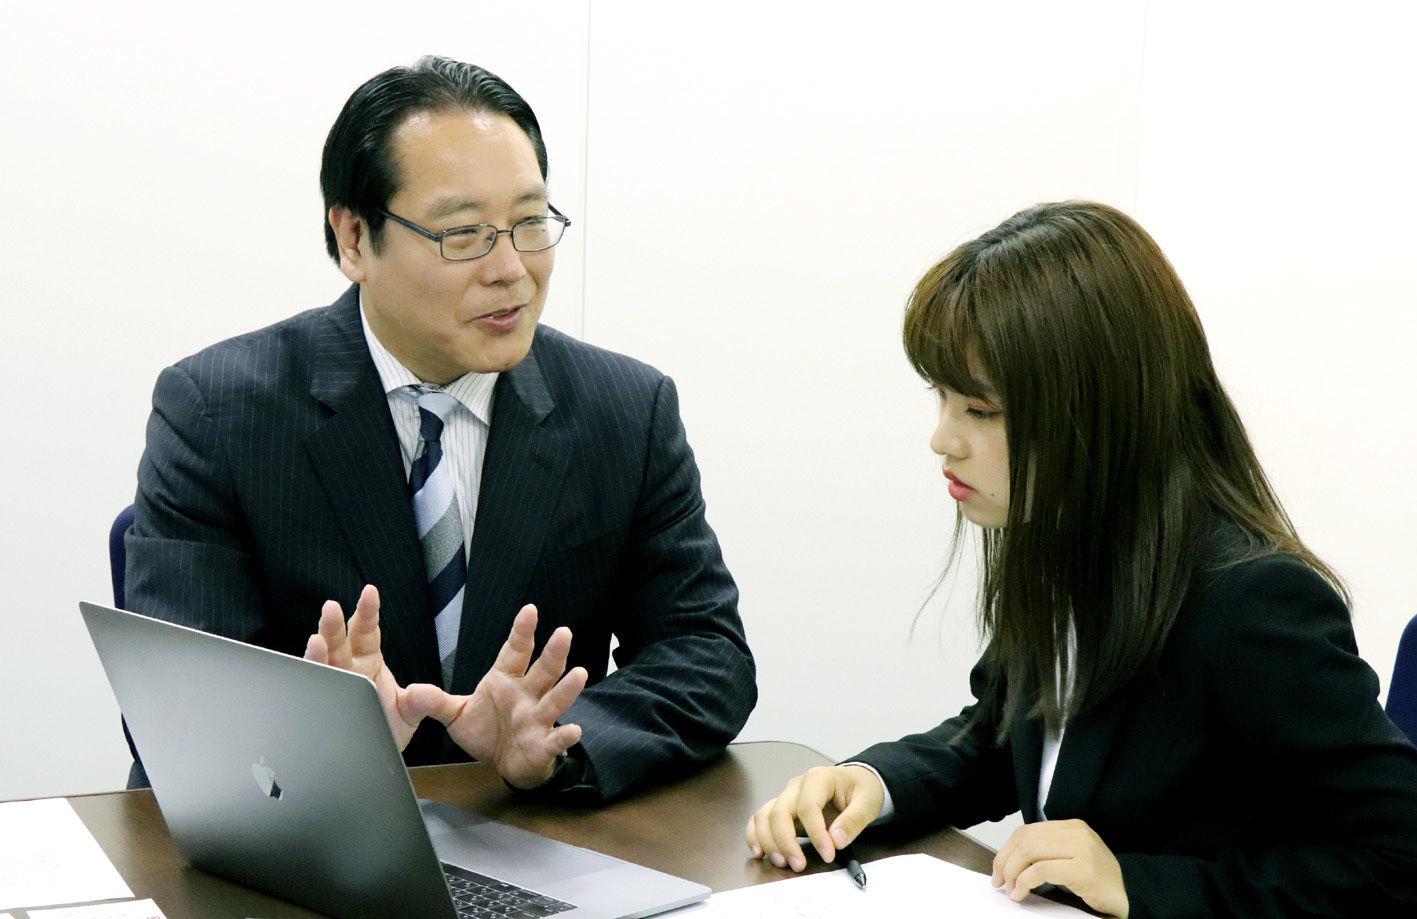 AOSリーガルテック 佐々木隆仁社長に聞く MAOガールインタビュー(7)